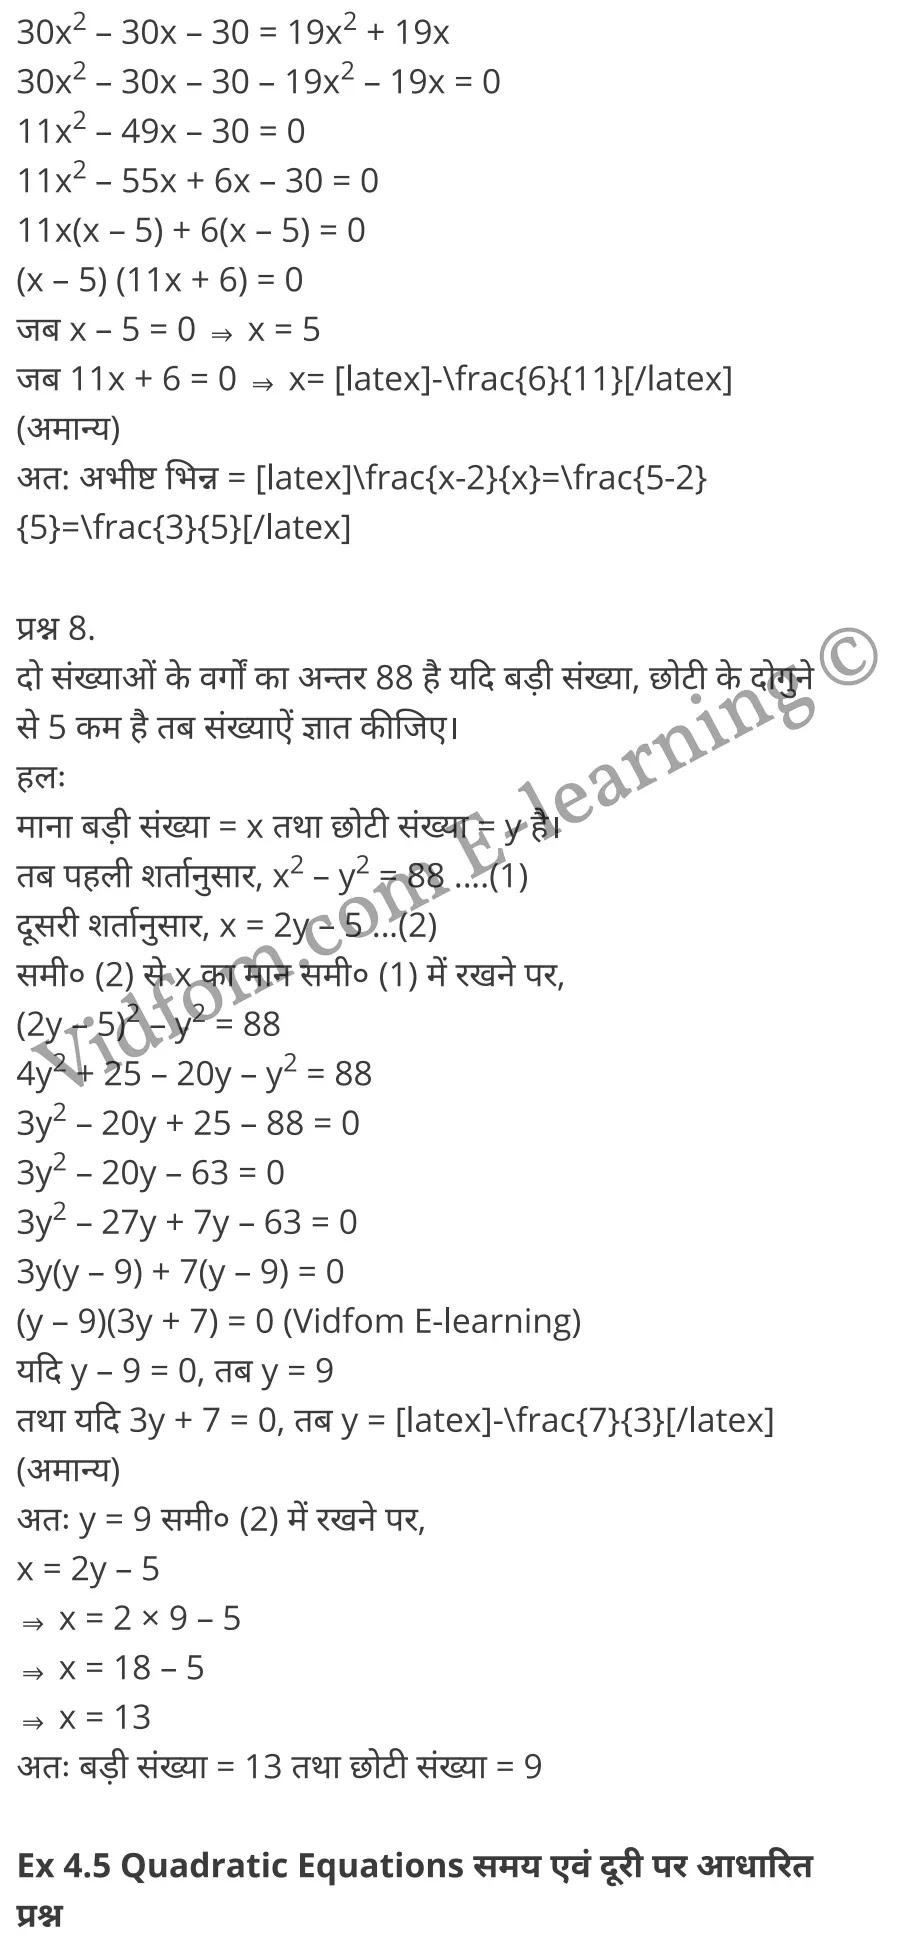 Class 10 Chapter 4 Quadratic Equations (द्विघात समीकरण)  Chapter 4 Quadratic Equations Ex 4.1 Chapter 4 Quadratic Equations Ex 4.2 Chapter 4 Quadratic Equations Ex 4.3 Chapter 4 Quadratic Equations Ex 4.4 Chapter 4 Quadratic Equations Ex 4.5 कक्षा 10 बालाजी गणित  के नोट्स  हिंदी में एनसीईआरटी समाधान,     class 10 Balaji Maths Chapter 4,   class 10 Balaji Maths Chapter 4 ncert solutions in Hindi,   class 10 Balaji Maths Chapter 4 notes in hindi,   class 10 Balaji Maths Chapter 4 question answer,   class 10 Balaji Maths Chapter 4 notes,   class 10 Balaji Maths Chapter 4 class 10 Balaji Maths Chapter 4 in  hindi,    class 10 Balaji Maths Chapter 4 important questions in  hindi,   class 10 Balaji Maths Chapter 4 notes in hindi,    class 10 Balaji Maths Chapter 4 test,   class 10 Balaji Maths Chapter 4 pdf,   class 10 Balaji Maths Chapter 4 notes pdf,   class 10 Balaji Maths Chapter 4 exercise solutions,   class 10 Balaji Maths Chapter 4 notes study rankers,   class 10 Balaji Maths Chapter 4 notes,    class 10 Balaji Maths Chapter 4  class 10  notes pdf,   class 10 Balaji Maths Chapter 4 class 10  notes  ncert,   class 10 Balaji Maths Chapter 4 class 10 pdf,   class 10 Balaji Maths Chapter 4  book,   class 10 Balaji Maths Chapter 4 quiz class 10  ,    10  th class 10 Balaji Maths Chapter 4  book up board,   up board 10  th class 10 Balaji Maths Chapter 4 notes,  class 10 Balaji Maths,   class 10 Balaji Maths ncert solutions in Hindi,   class 10 Balaji Maths notes in hindi,   class 10 Balaji Maths question answer,   class 10 Balaji Maths notes,  class 10 Balaji Maths class 10 Balaji Maths Chapter 4 in  hindi,    class 10 Balaji Maths important questions in  hindi,   class 10 Balaji Maths notes in hindi,    class 10 Balaji Maths test,  class 10 Balaji Maths class 10 Balaji Maths Chapter 4 pdf,   class 10 Balaji Maths notes pdf,   class 10 Balaji Maths exercise solutions,   class 10 Balaji Maths,  class 10 Balaji Maths notes study rankers,   class 10 Balaji Maths notes,  cl